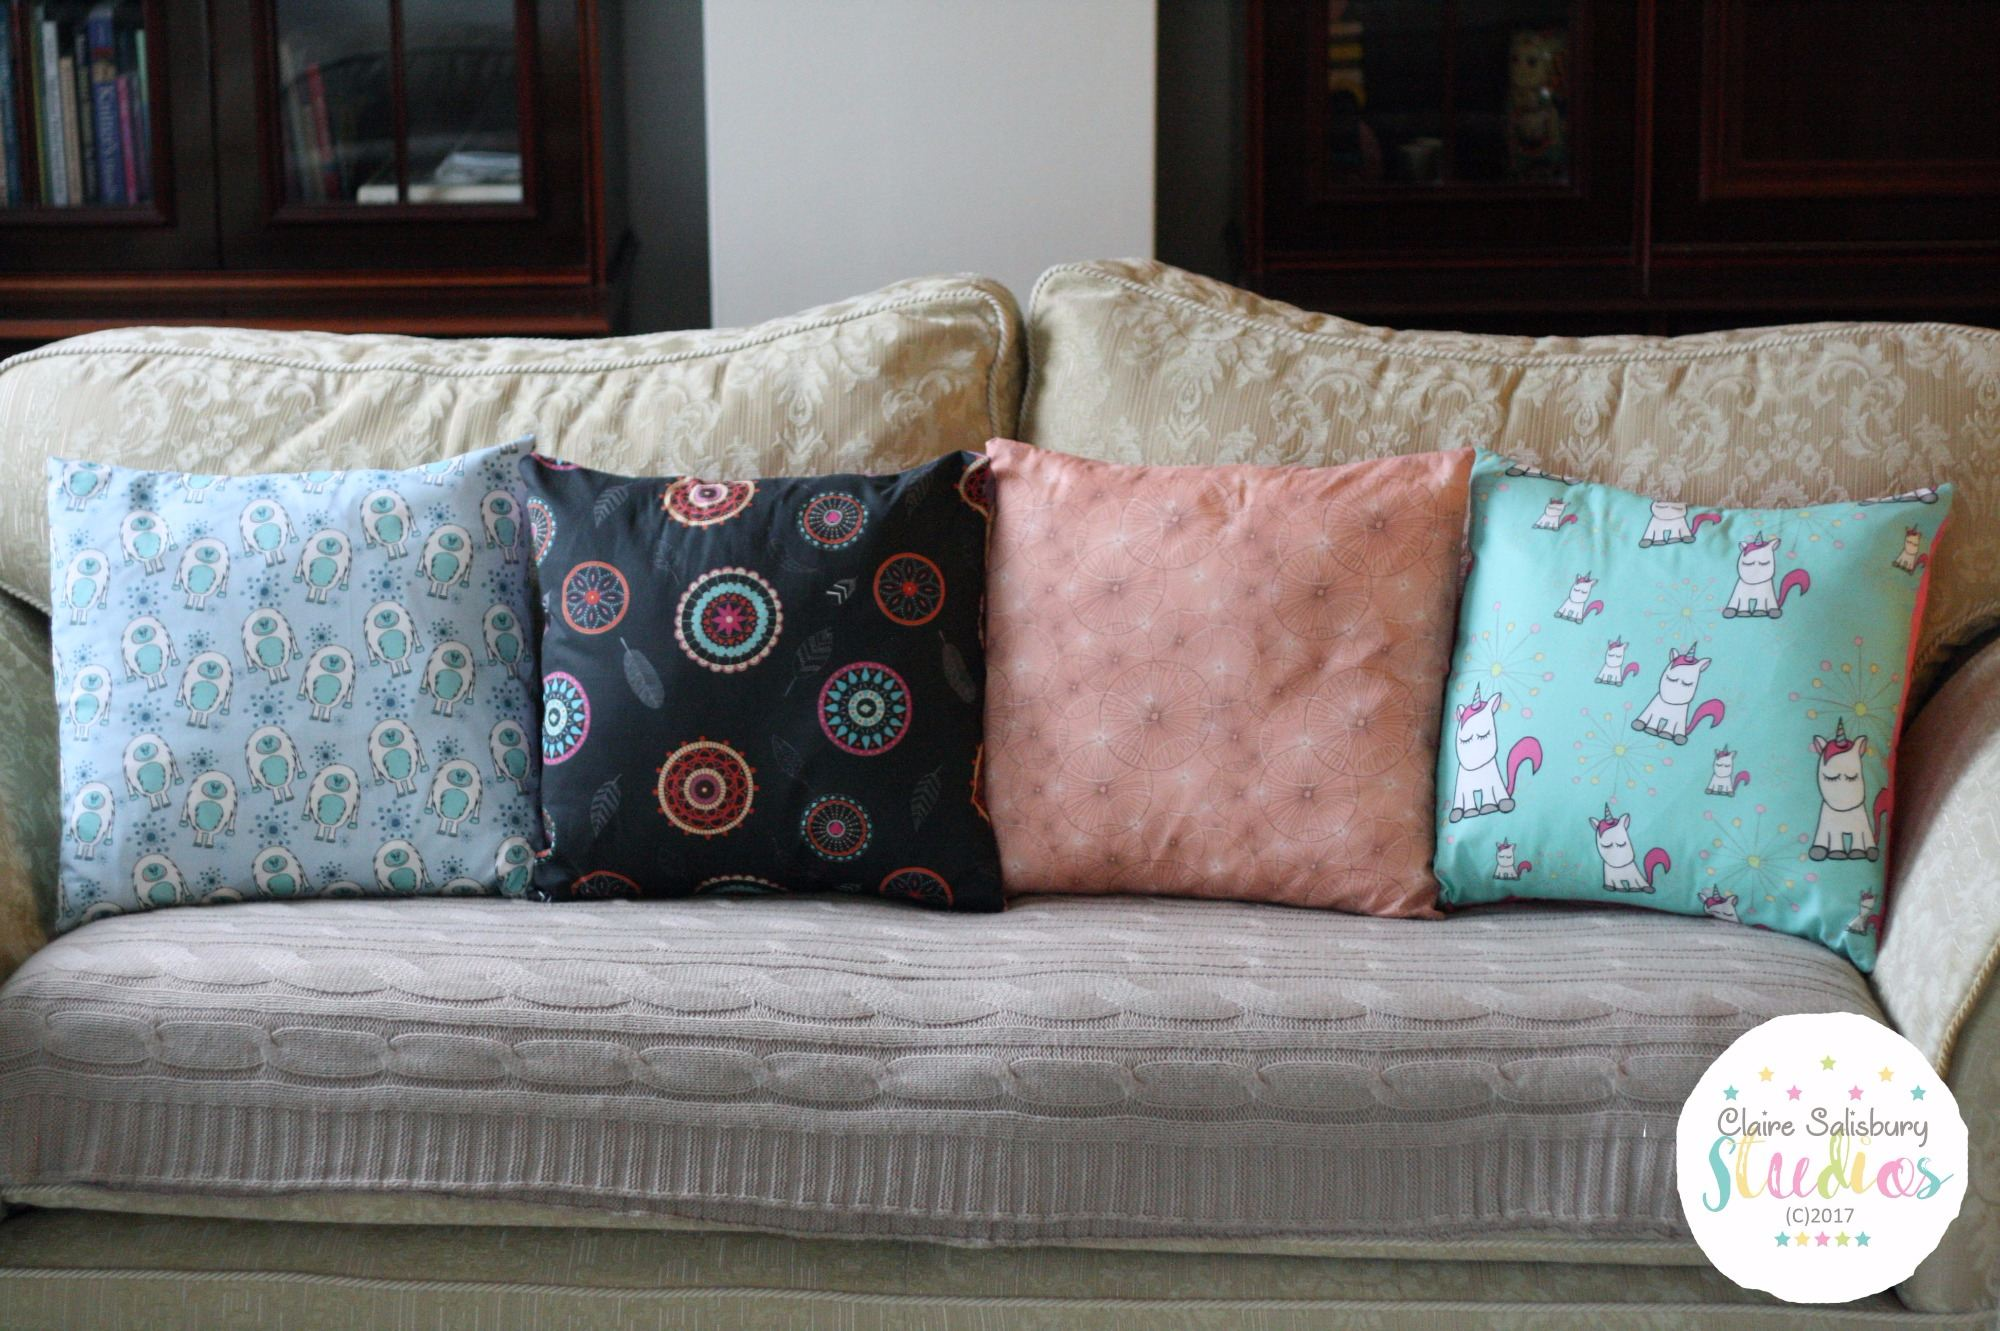 Unicorn, Yeti, Dream Catcher and Sea Urchin Cushions